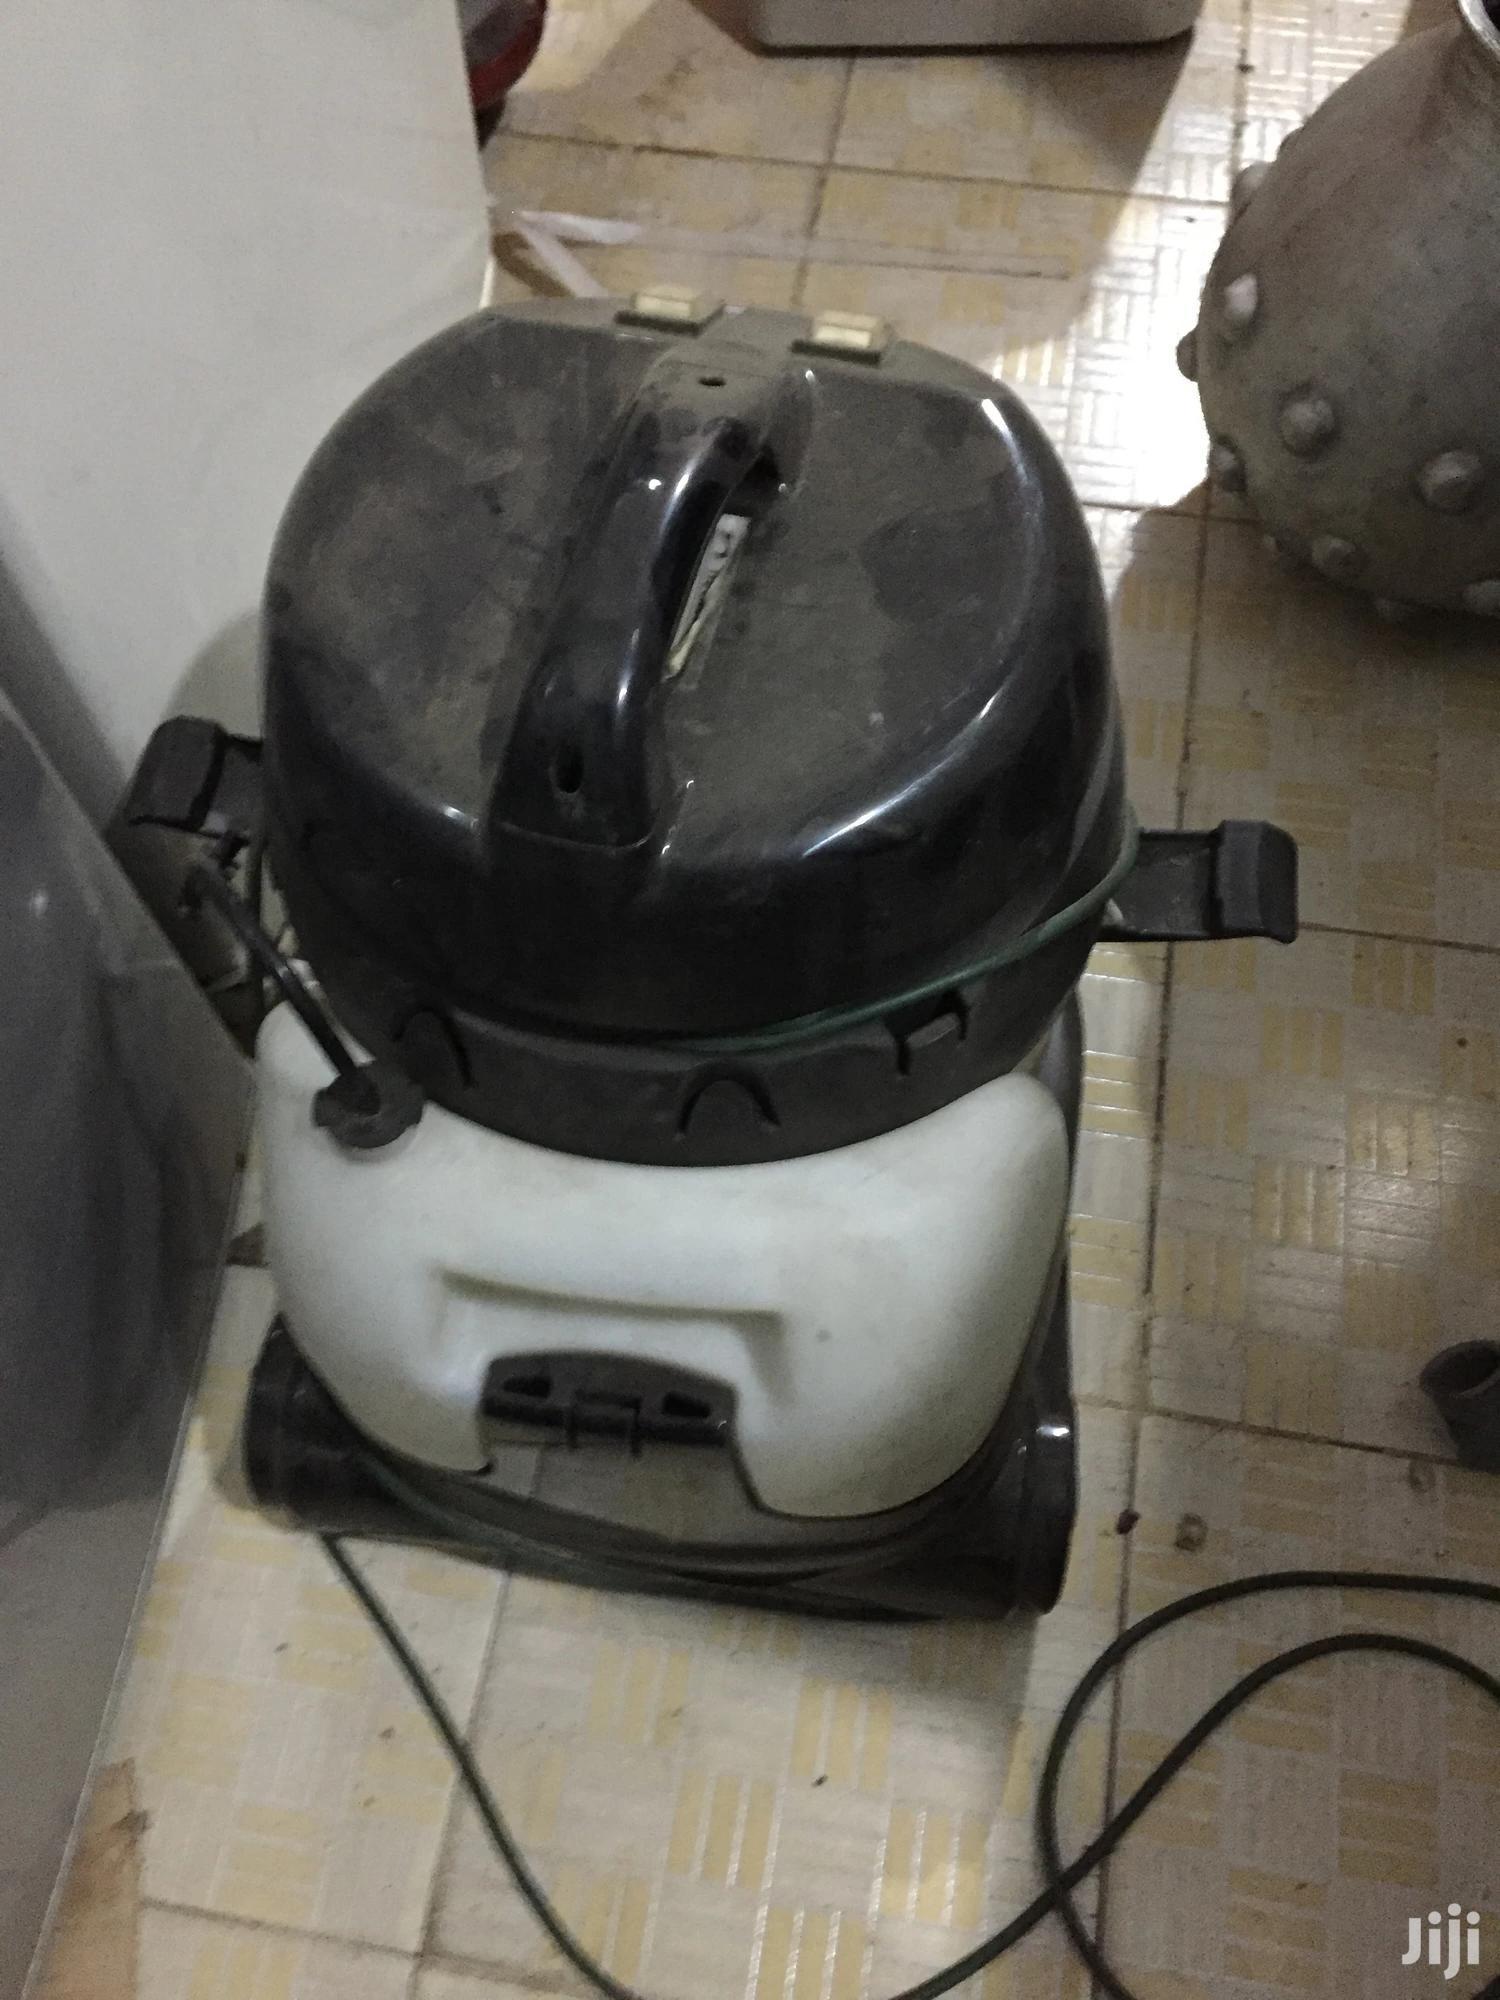 Lloyds Wet & Dry Vacuum Cleaner   Home Appliances for sale in Nairobi Central, Nairobi, Kenya